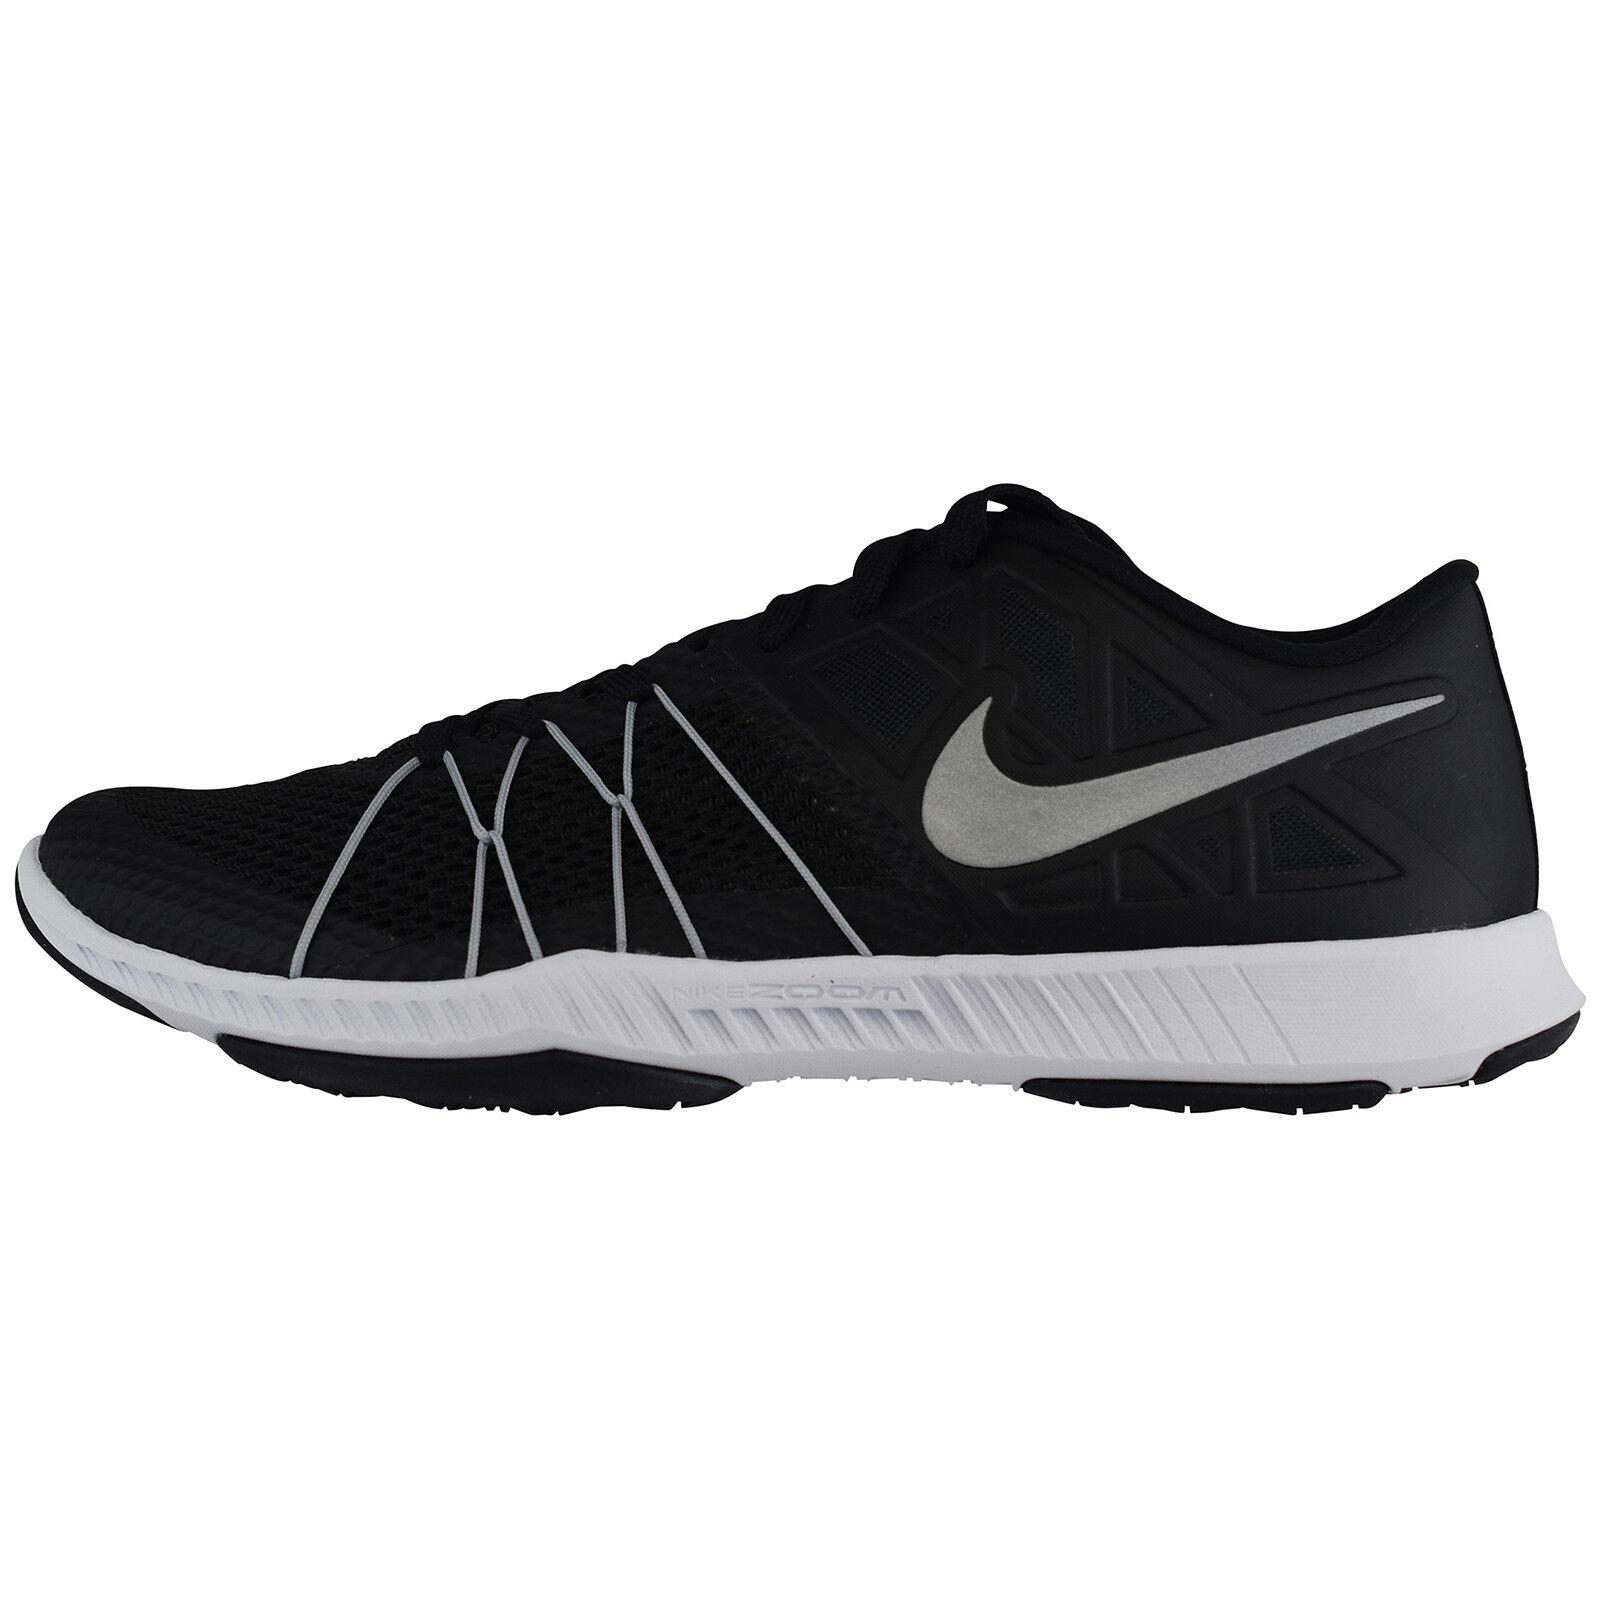 Nike Zoom Train Incrotibly Fast 844803-001 Joggen Freizeit Laufschuhe Turnschuhe    | Modern